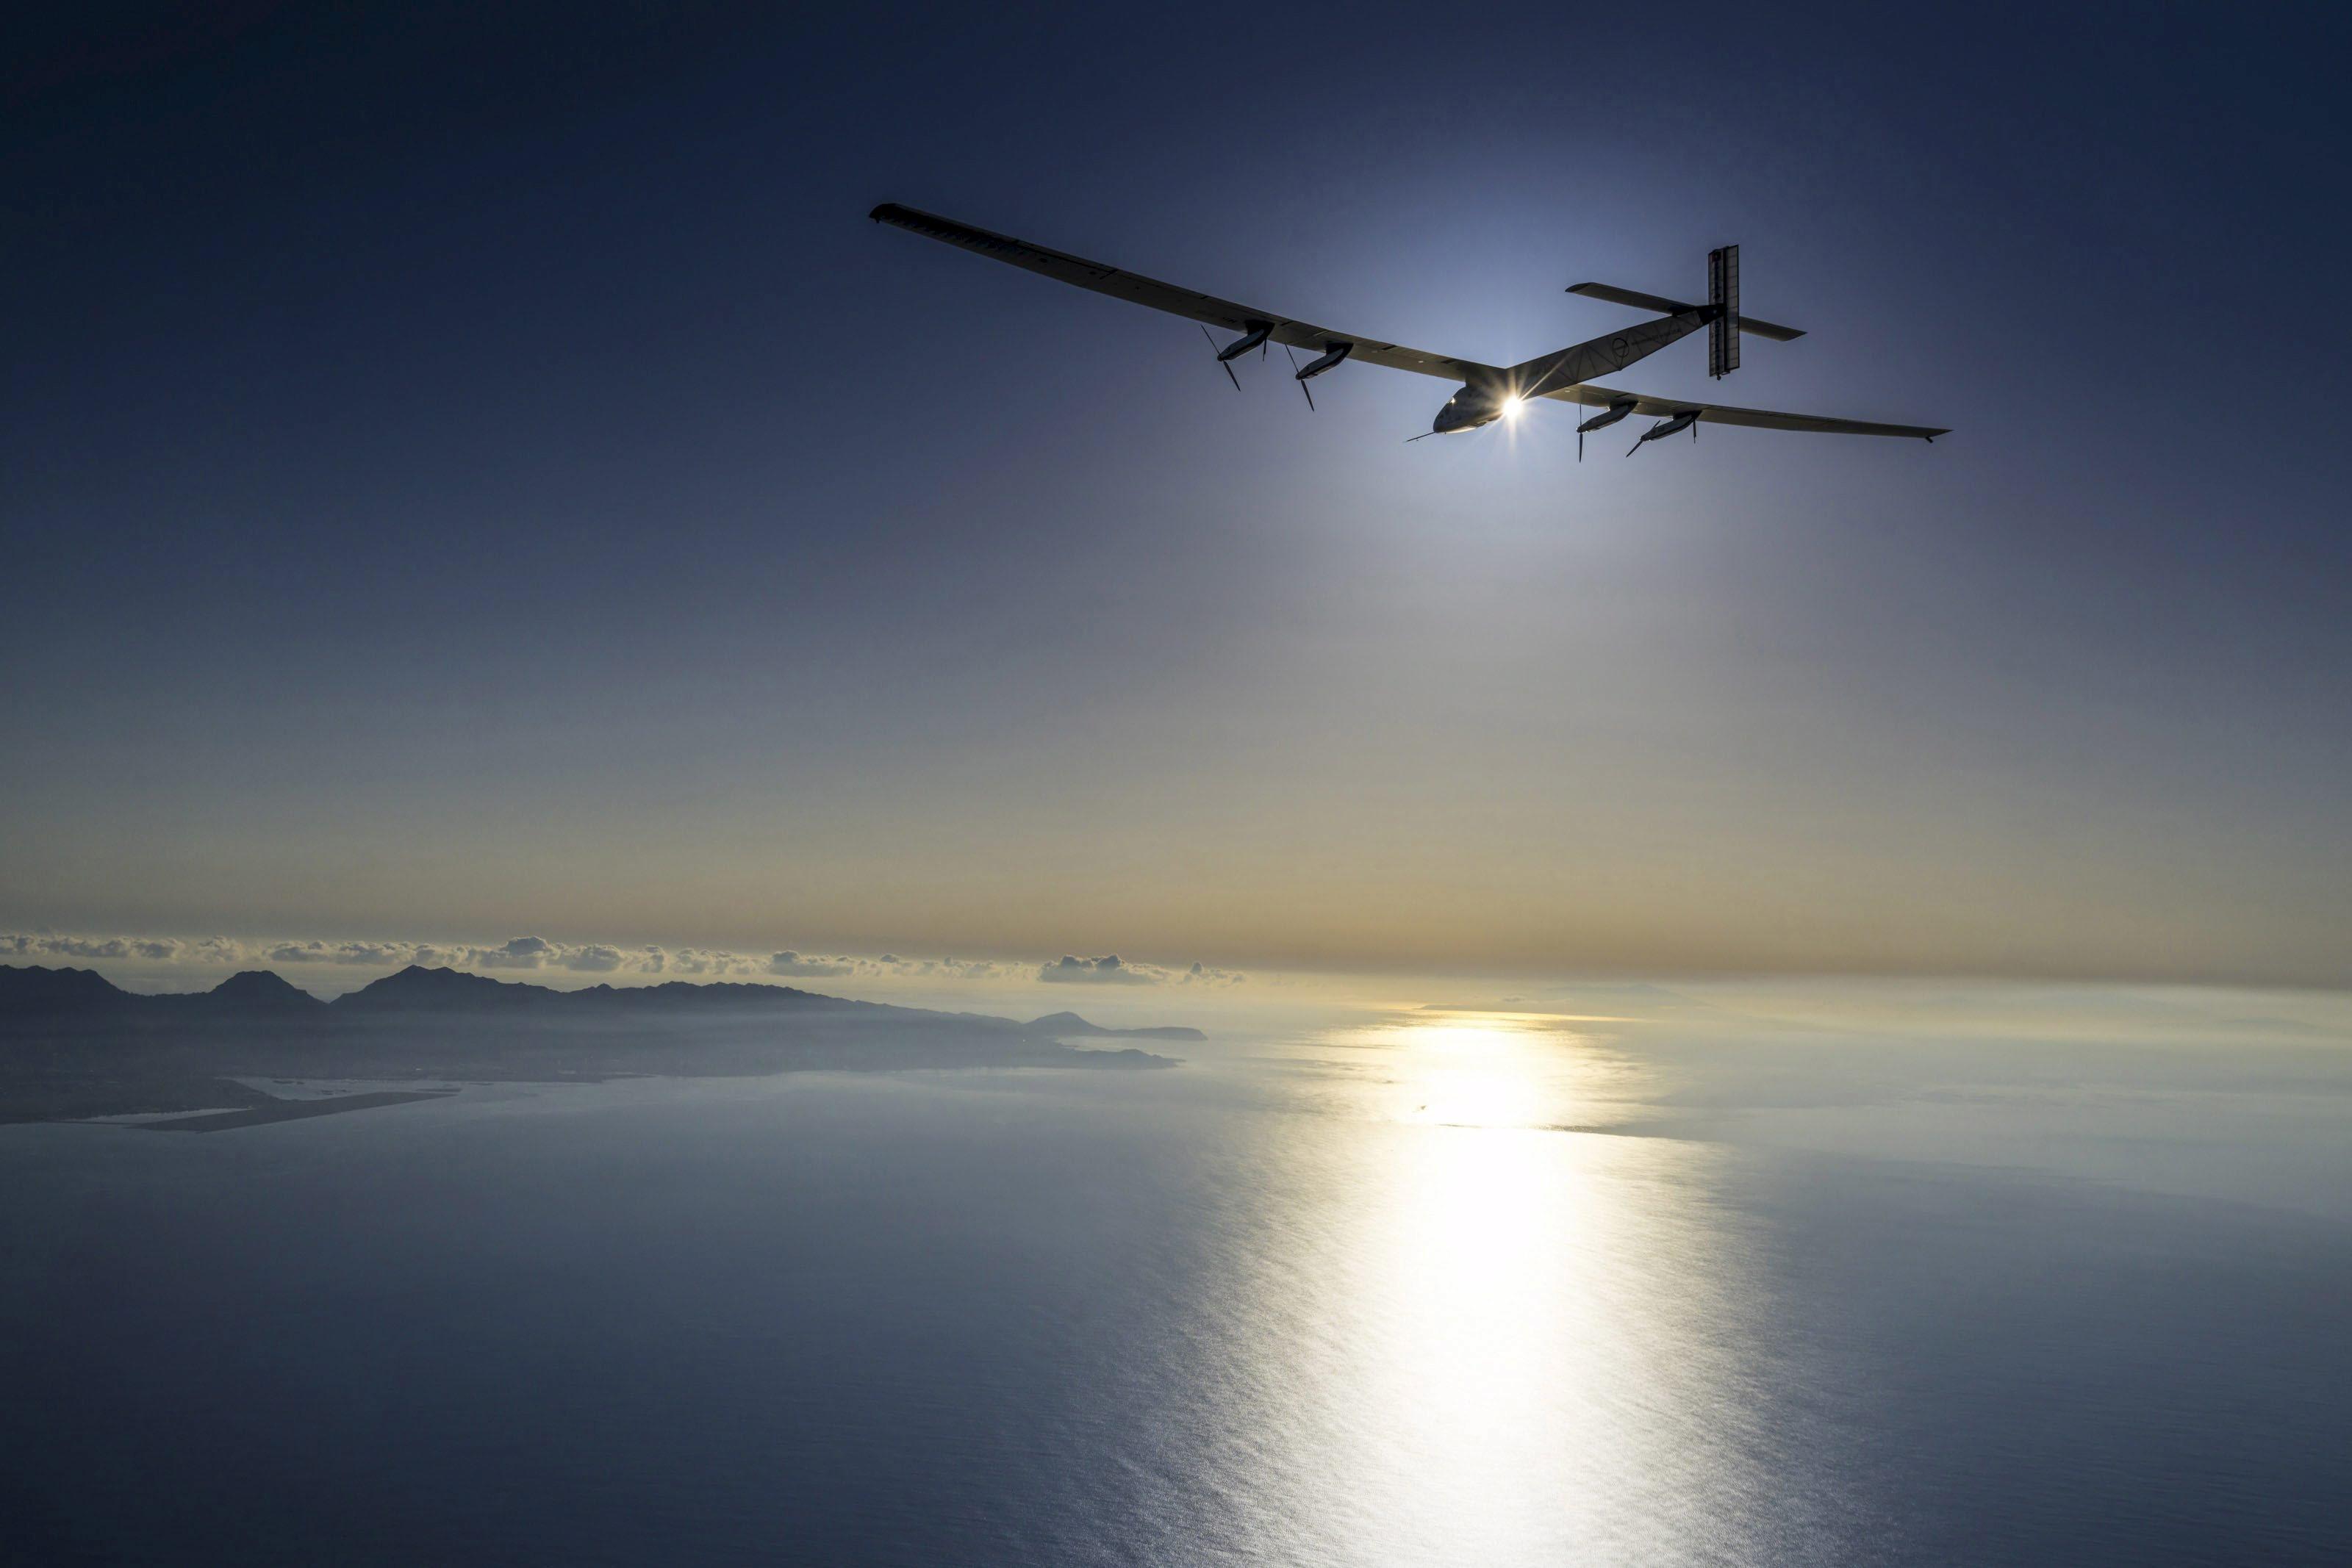 solar impulse 2 resumes round the world flight